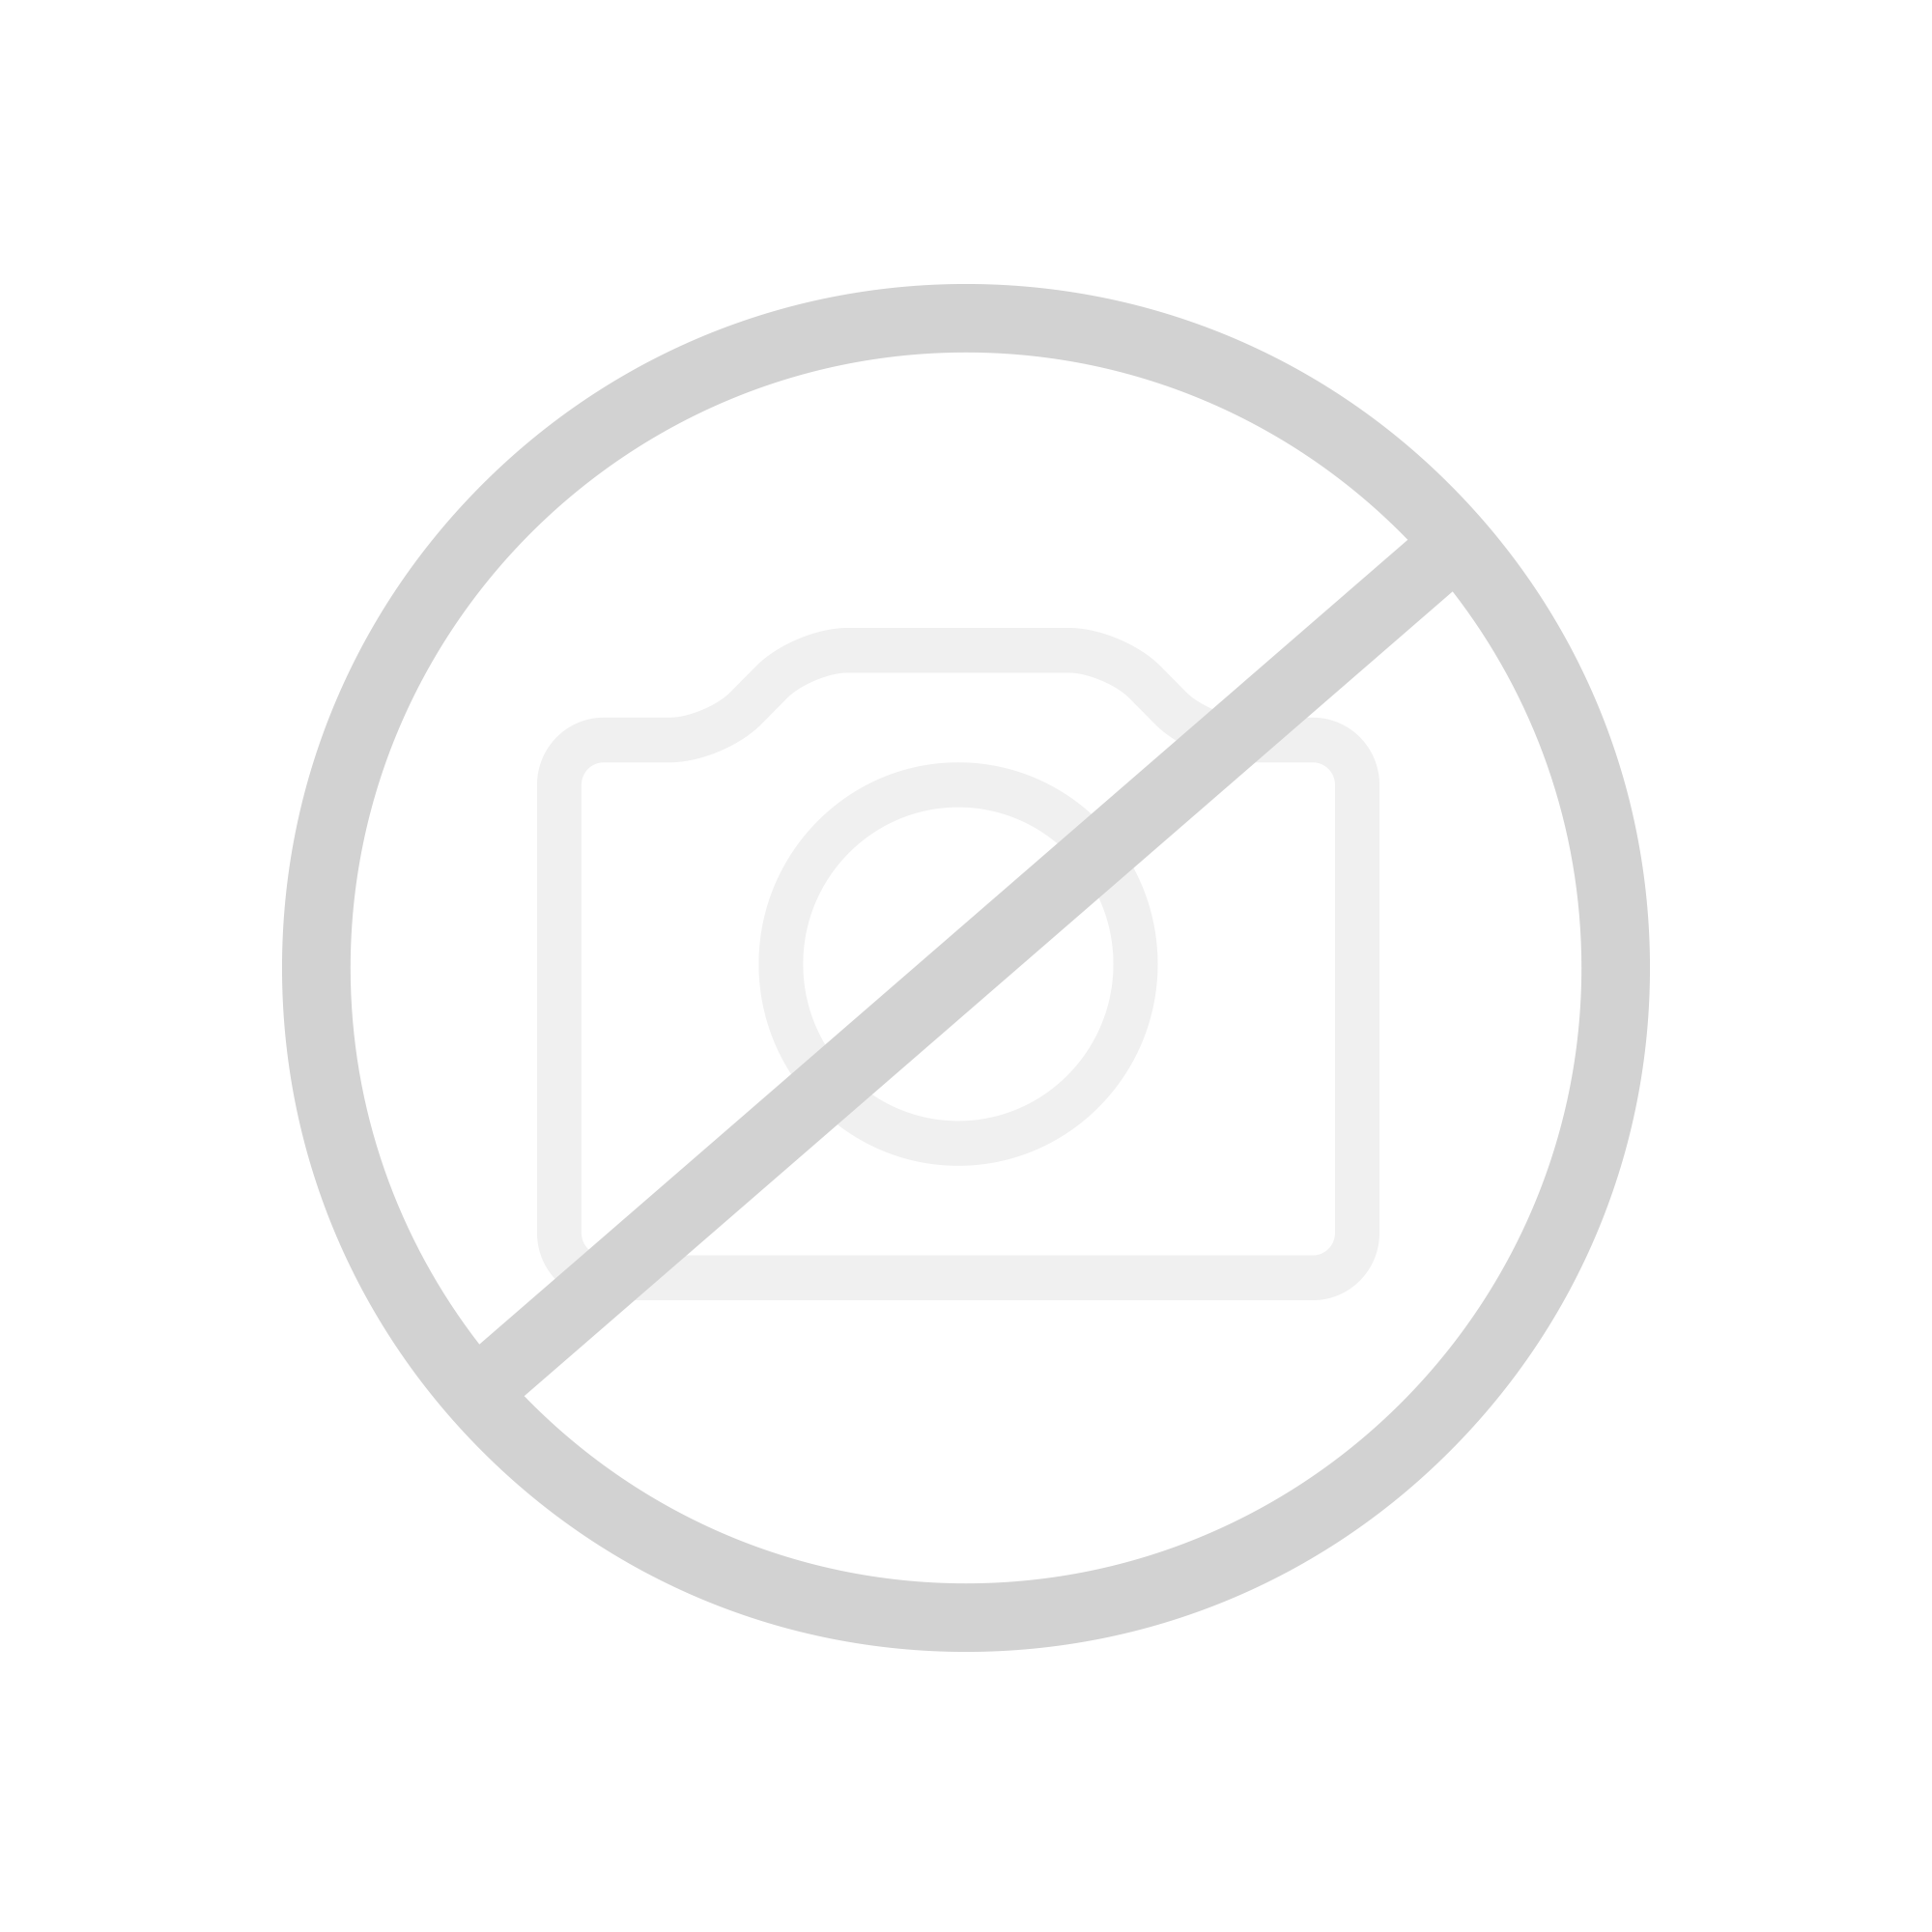 HSK Softcube XS2 Glas-Duschpaneel B: 315 H: 1730 mm mit Kopfbrause B: 300 T: 200 mm Glasfarbe weiß